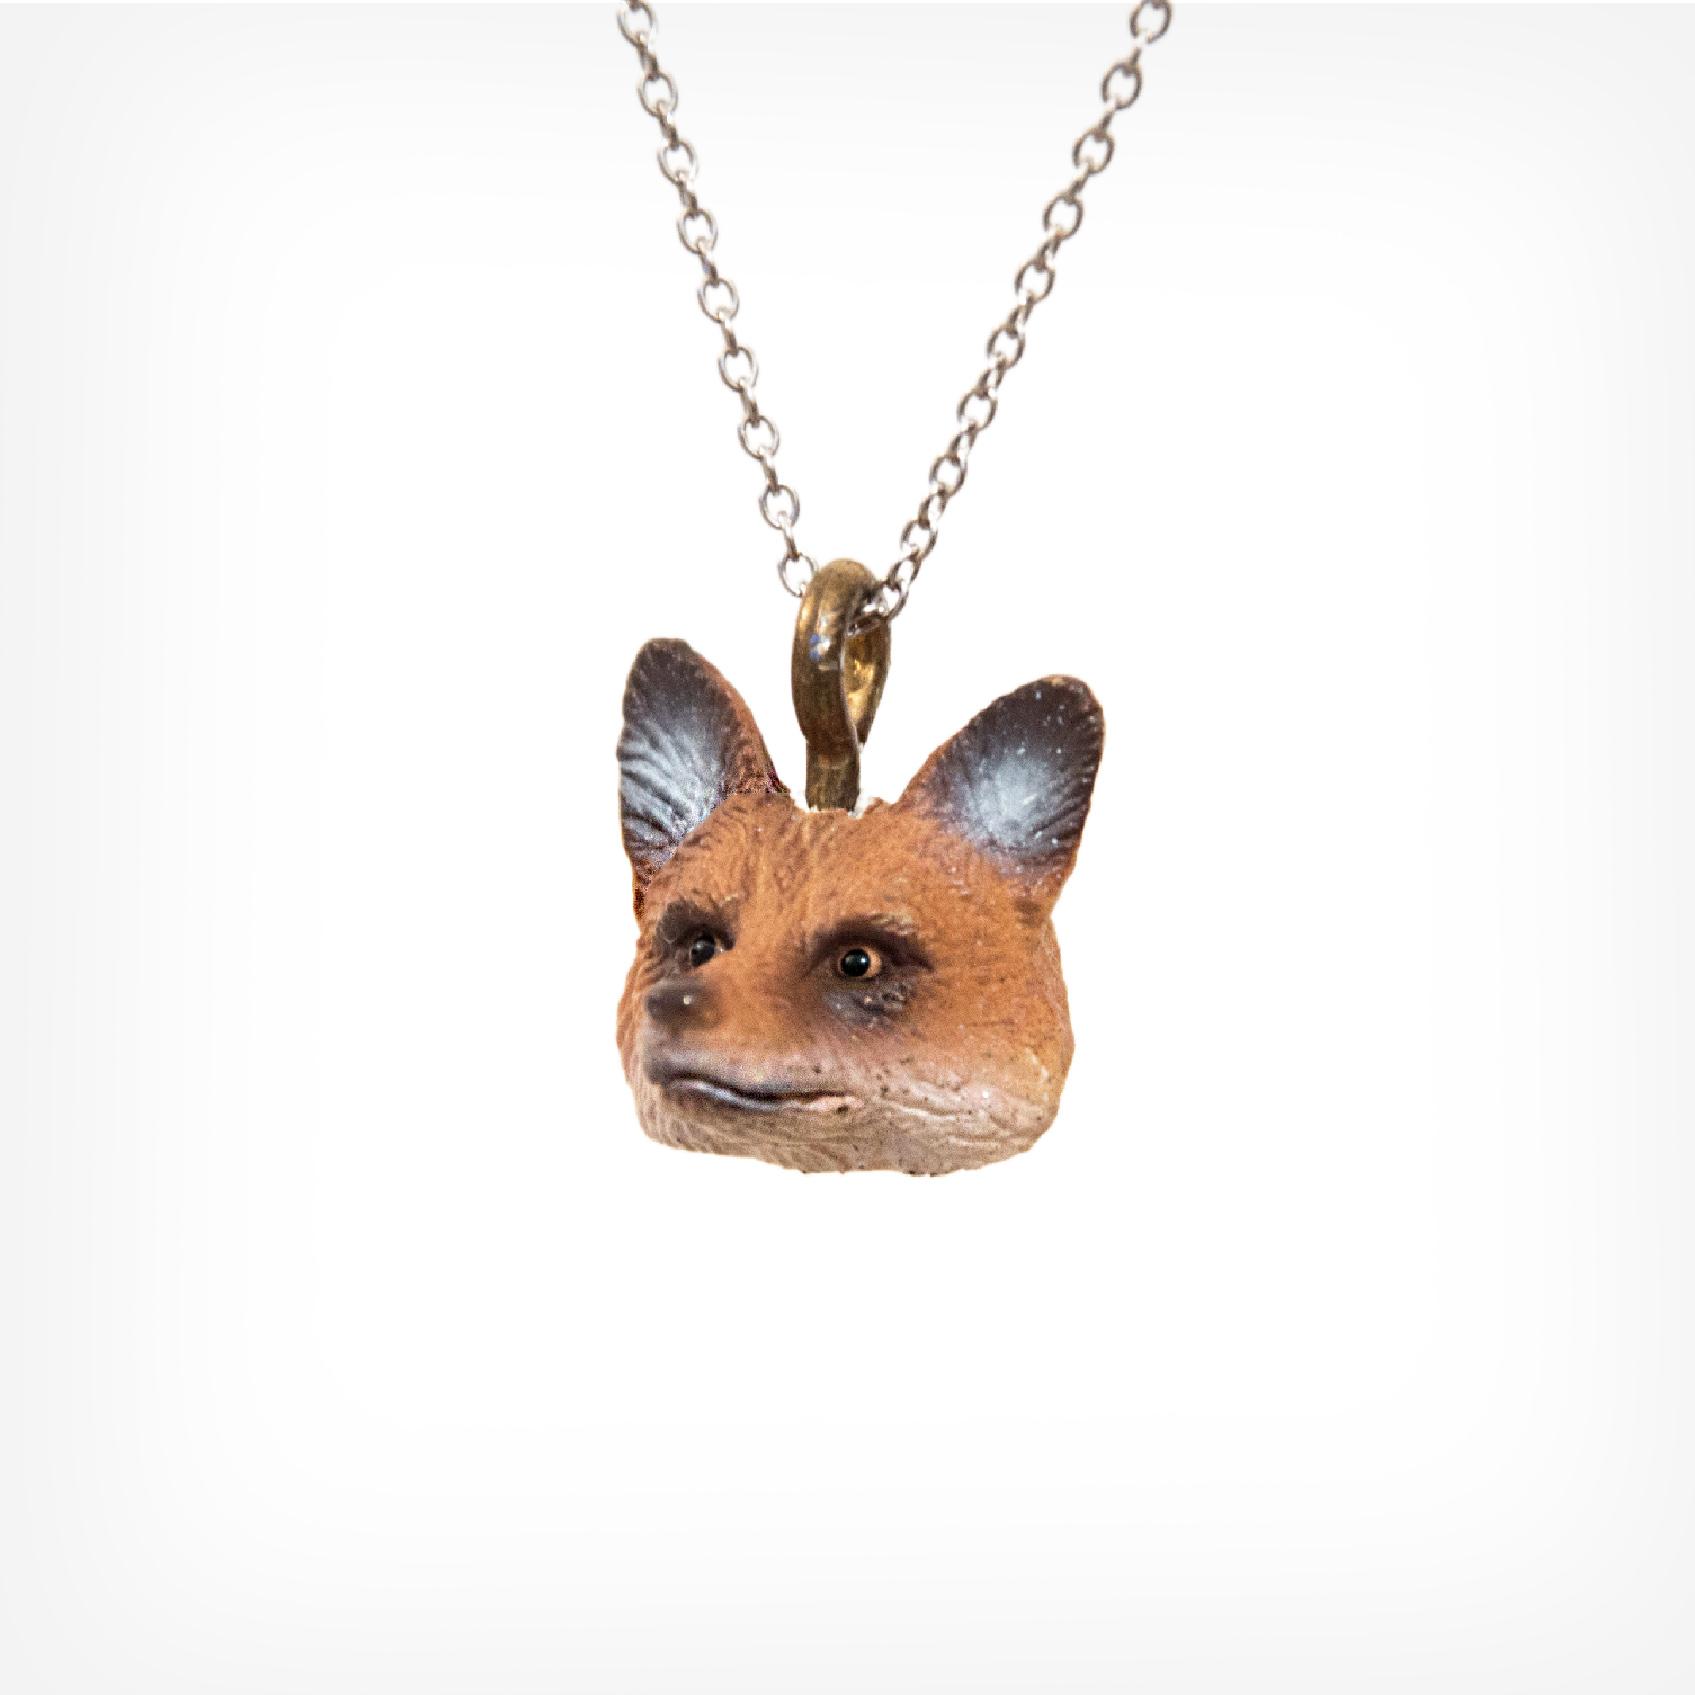 Fuchs | fox